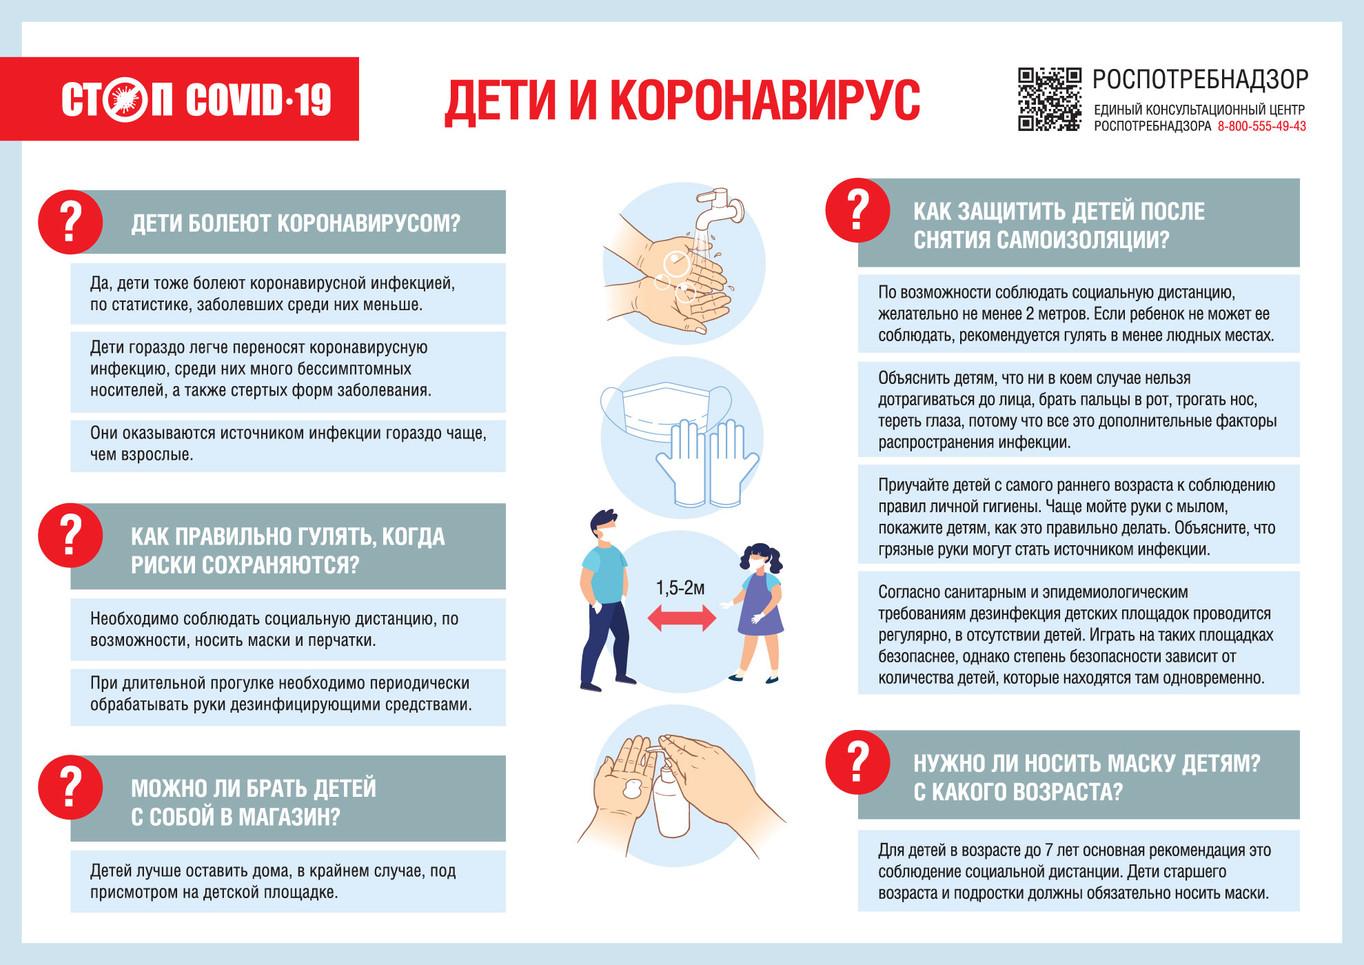 вх-7680_01-01-12_26_06_2020_A4-Vopros-ot